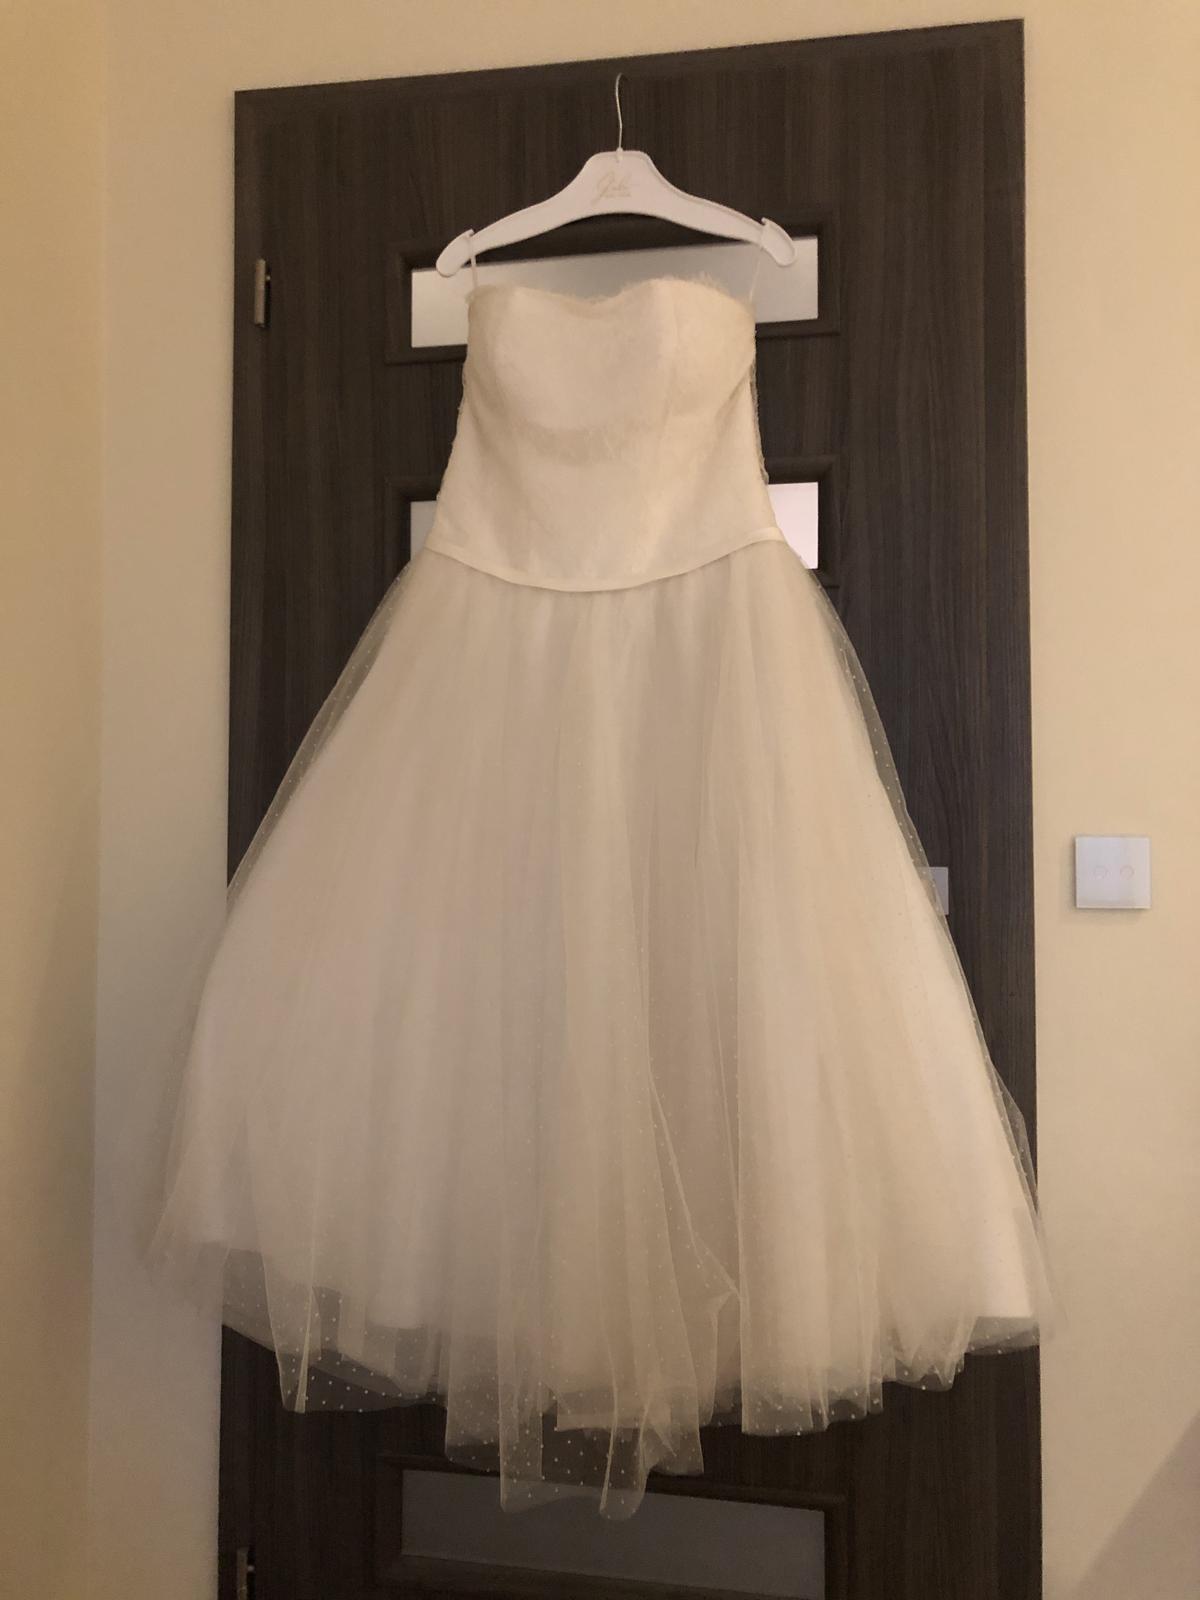 Svadobné šaty ivory s bodkami, po clenky, 36-40 - Obrázok č. 1